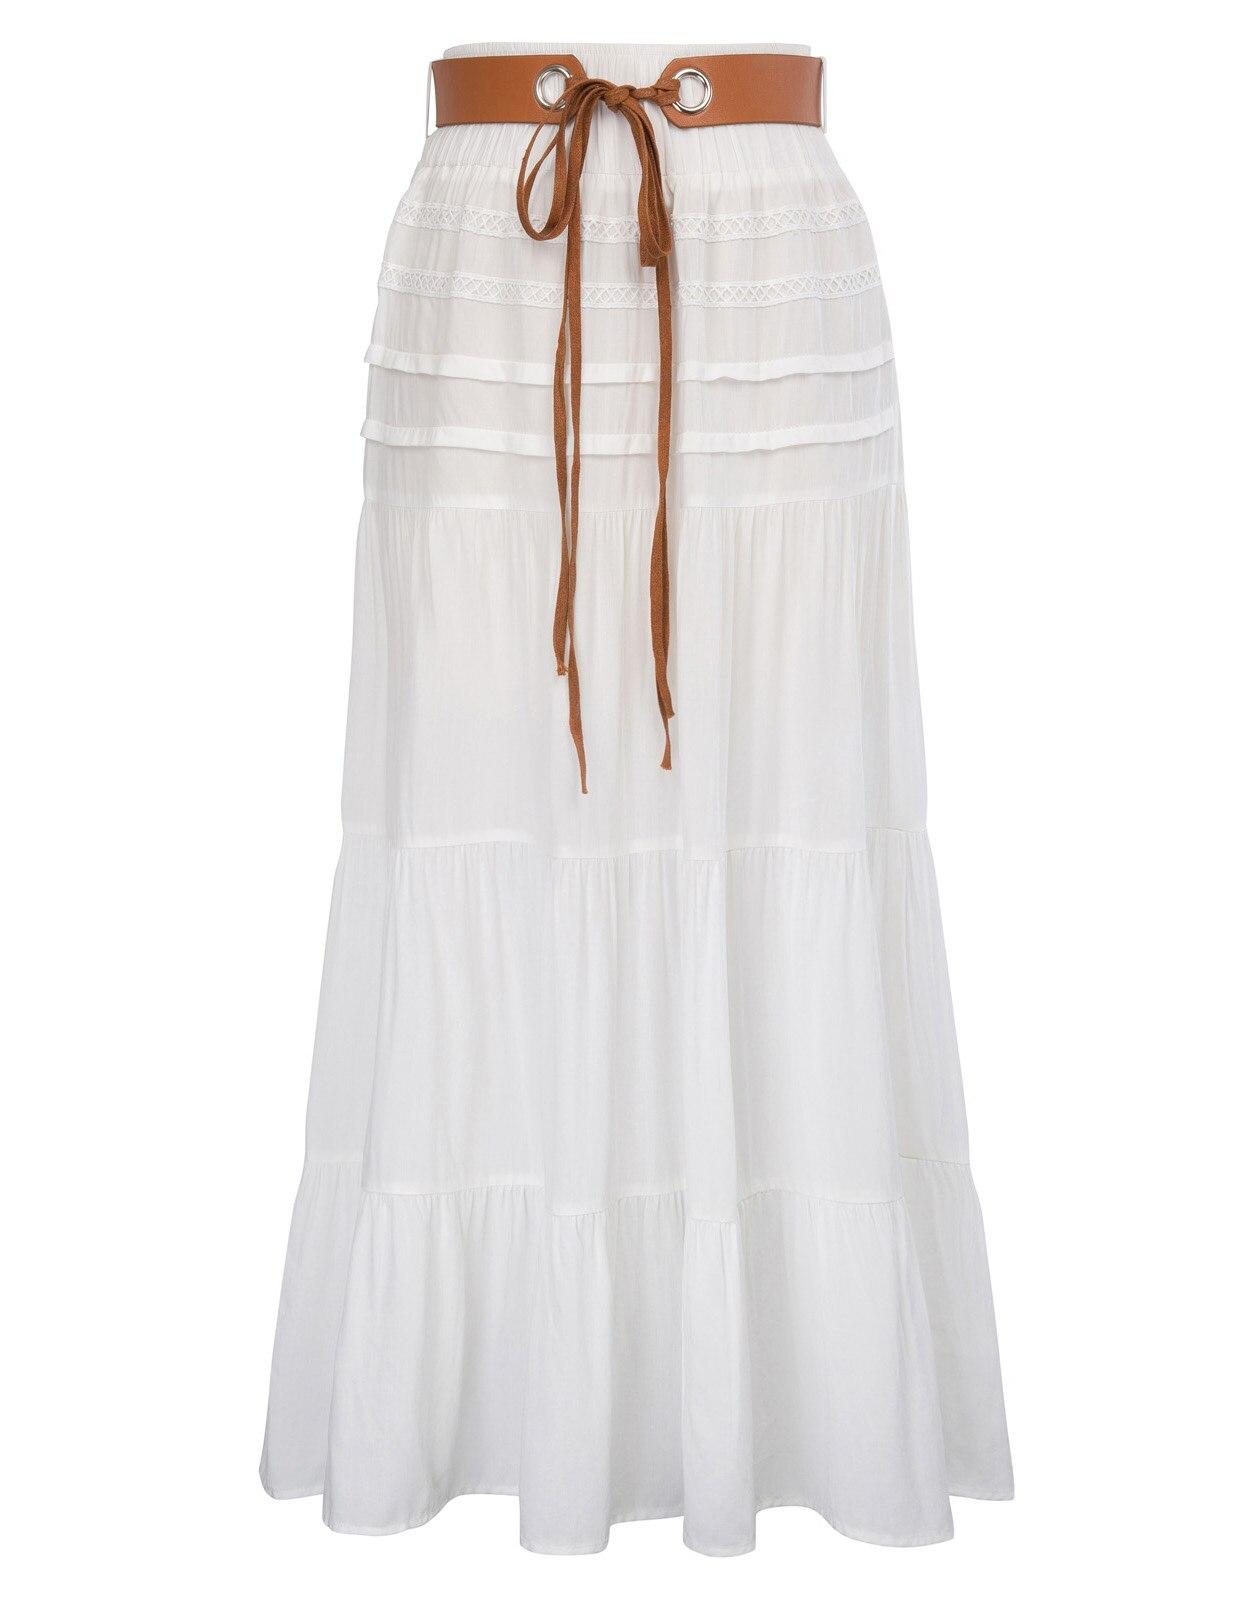 Retro Vintage Women skirt Comfy Elastic Waist Rayon Flared A-Line Skirt With Belt